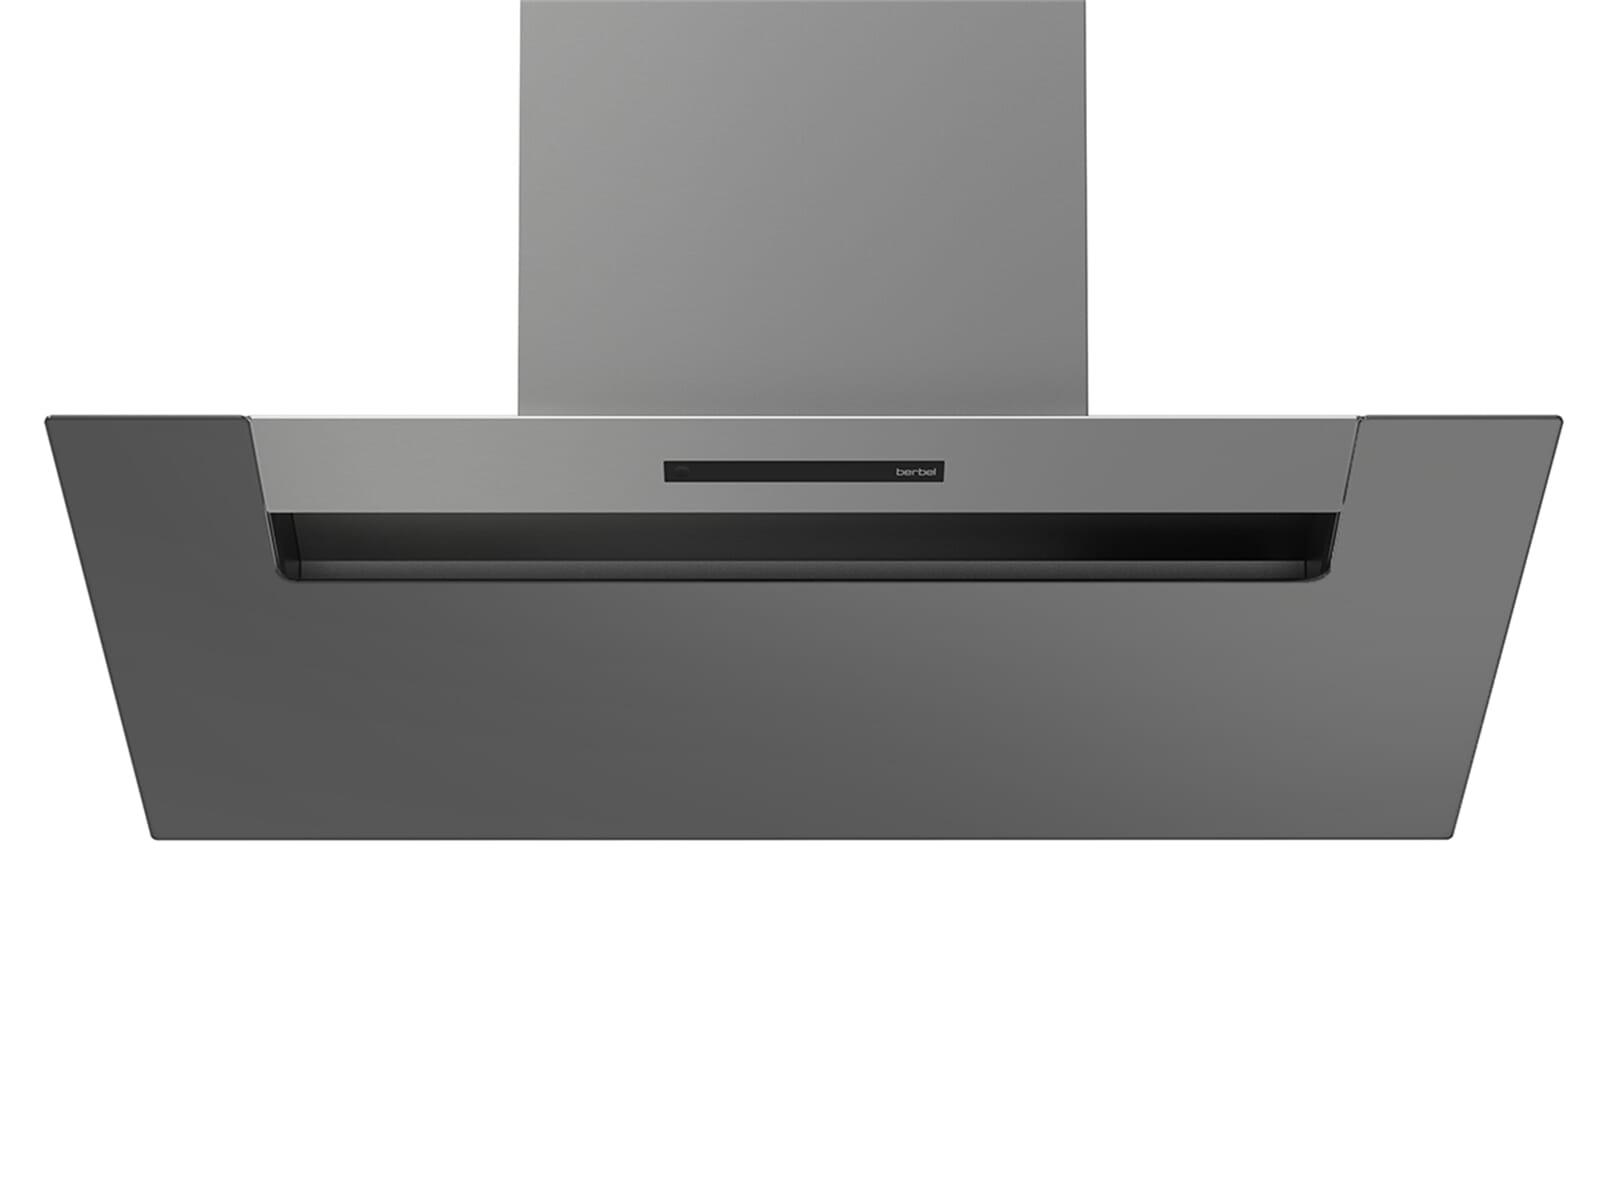 berbel ergoline 2 bkh 90 eg 2 kopffreihaube silber metallic. Black Bedroom Furniture Sets. Home Design Ideas